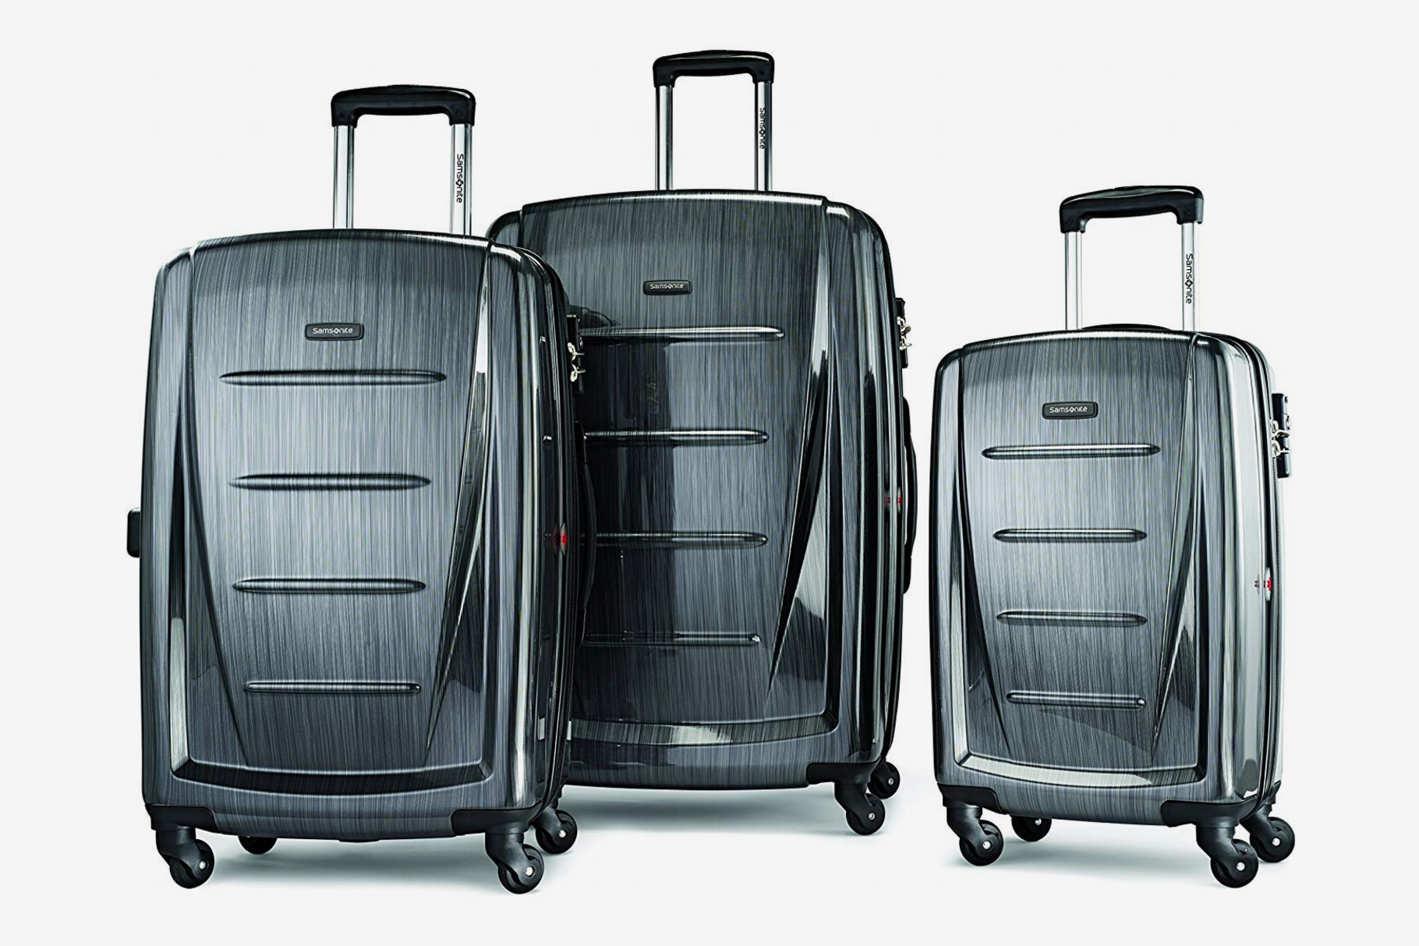 Samsonite Winfield 2 3-Piece Hardside Luggage Set